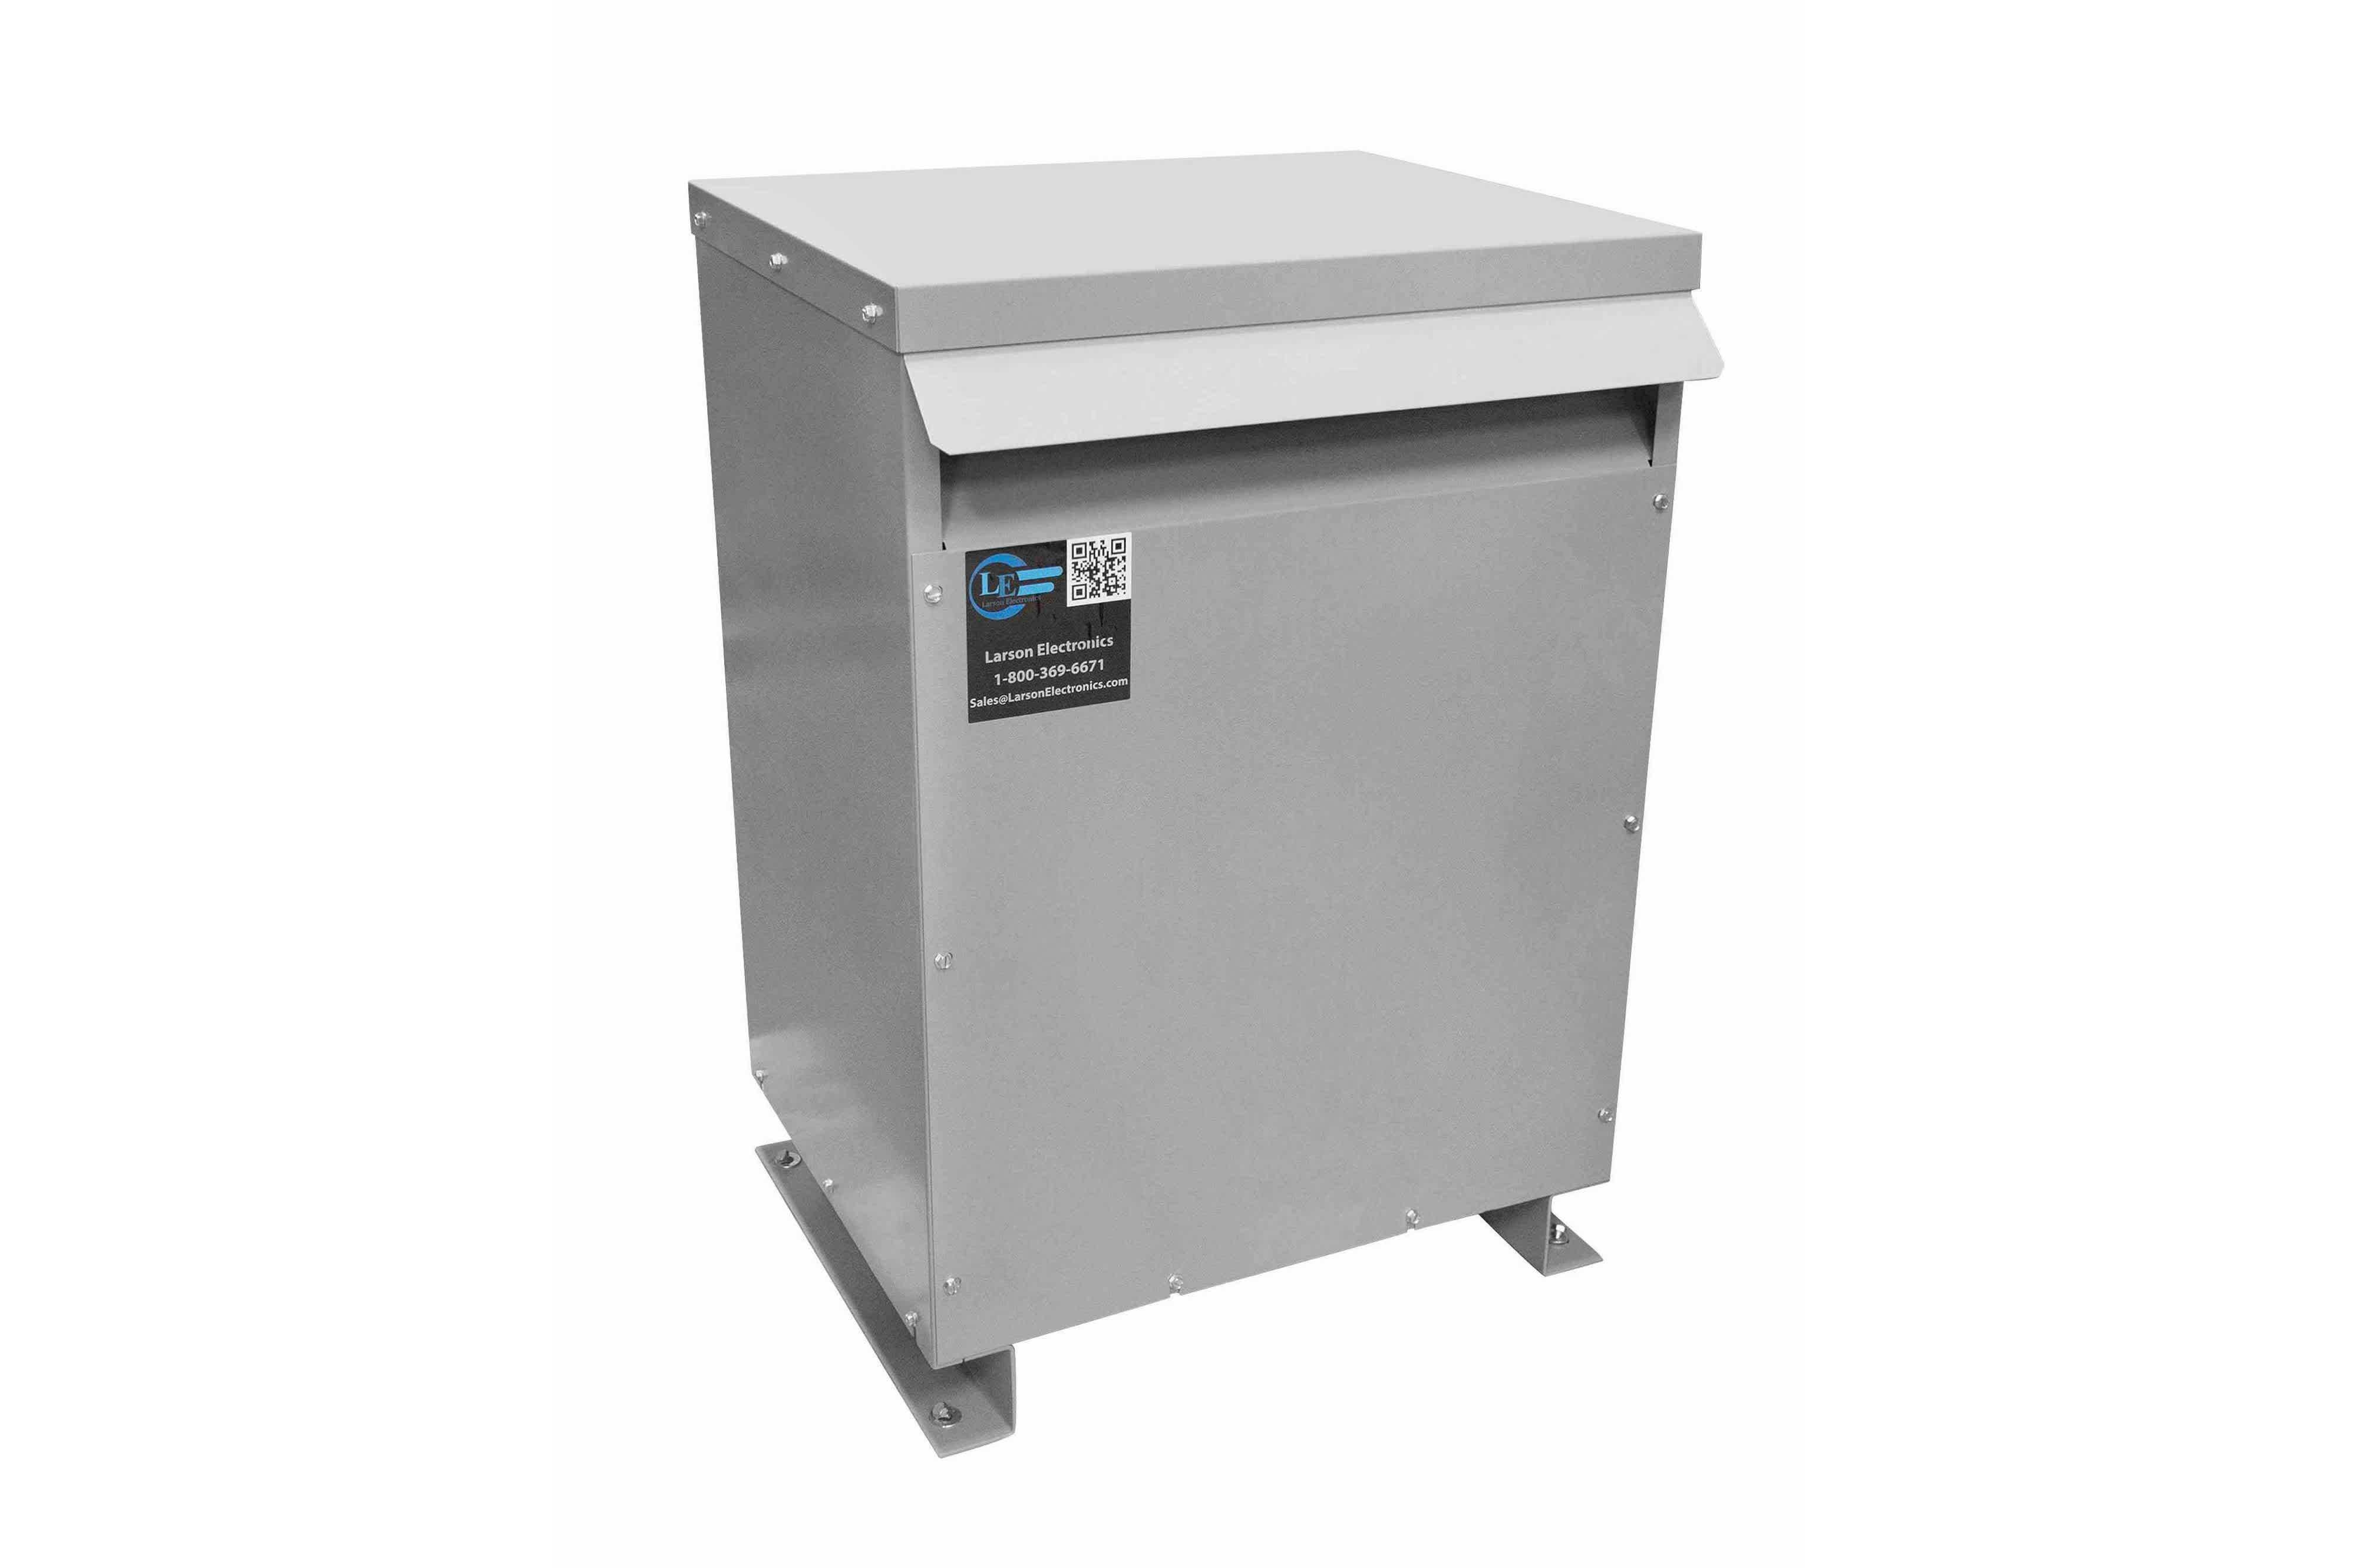 40 kVA 3PH Isolation Transformer, 380V Wye Primary, 208V Delta Secondary, N3R, Ventilated, 60 Hz